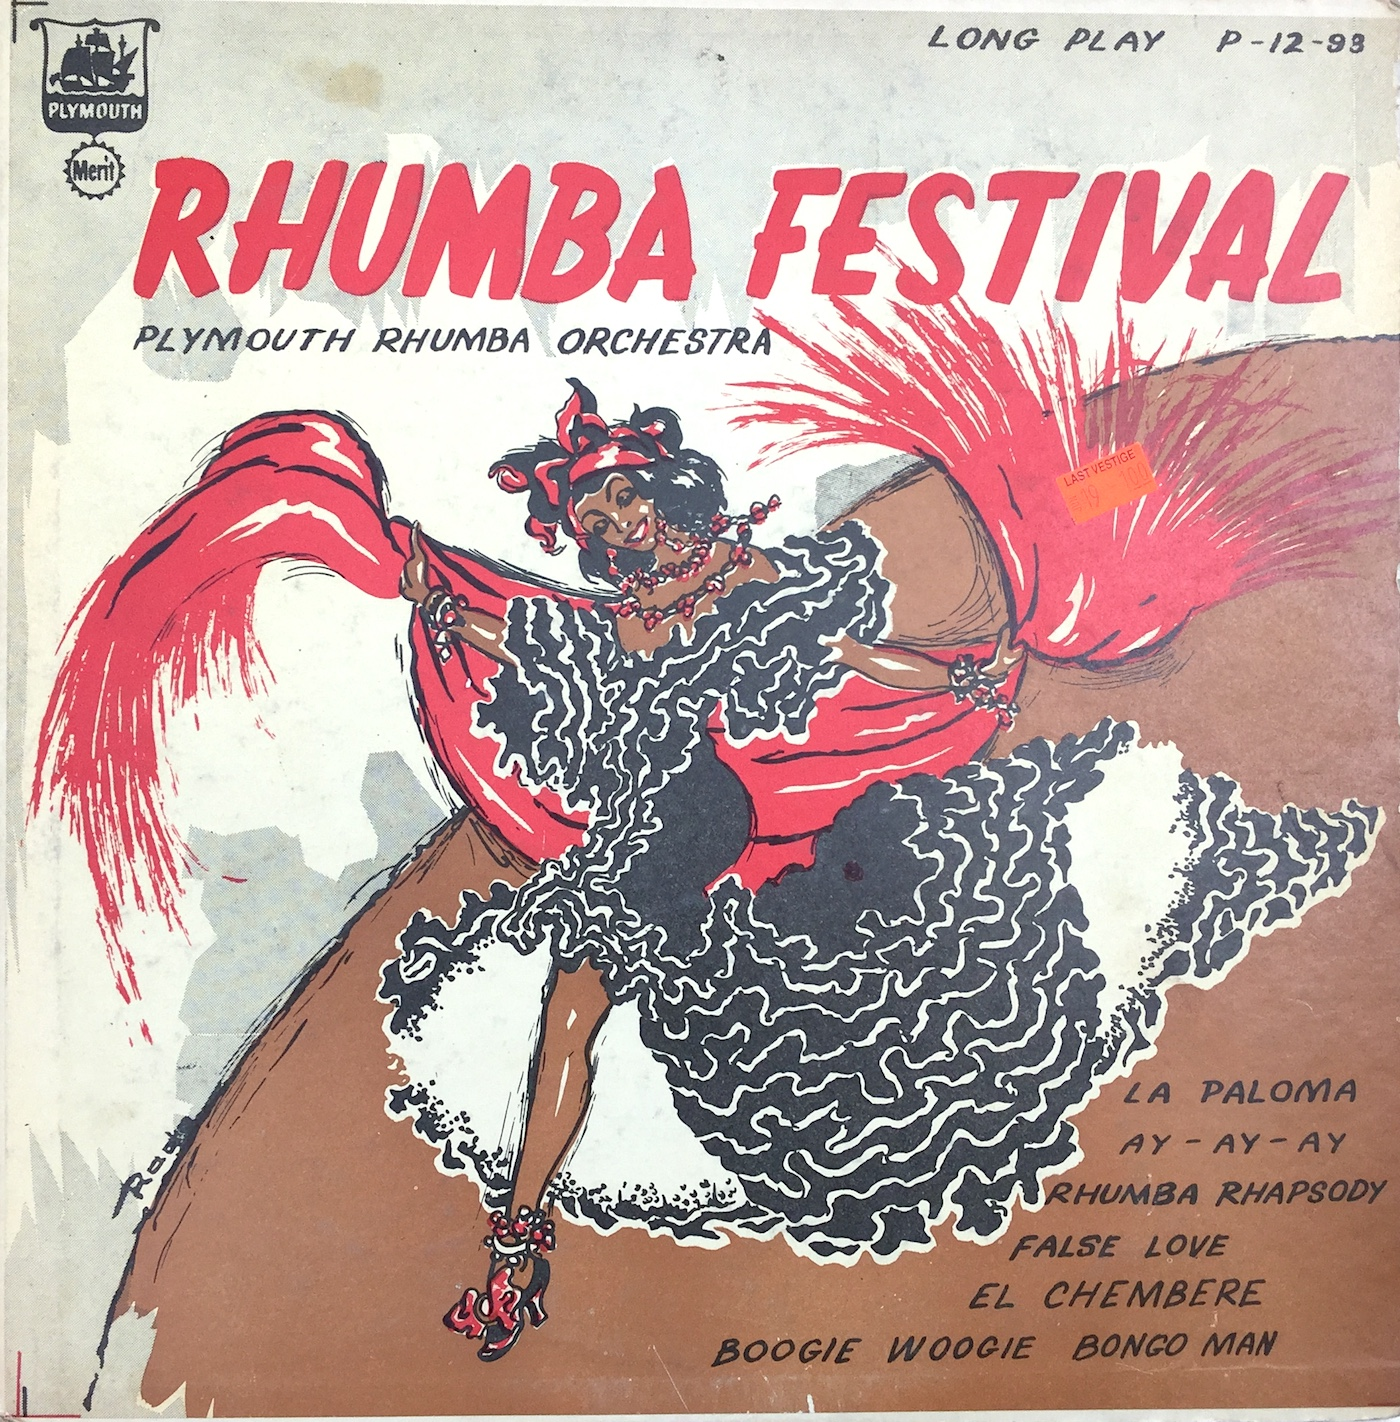 RhumbaFestival